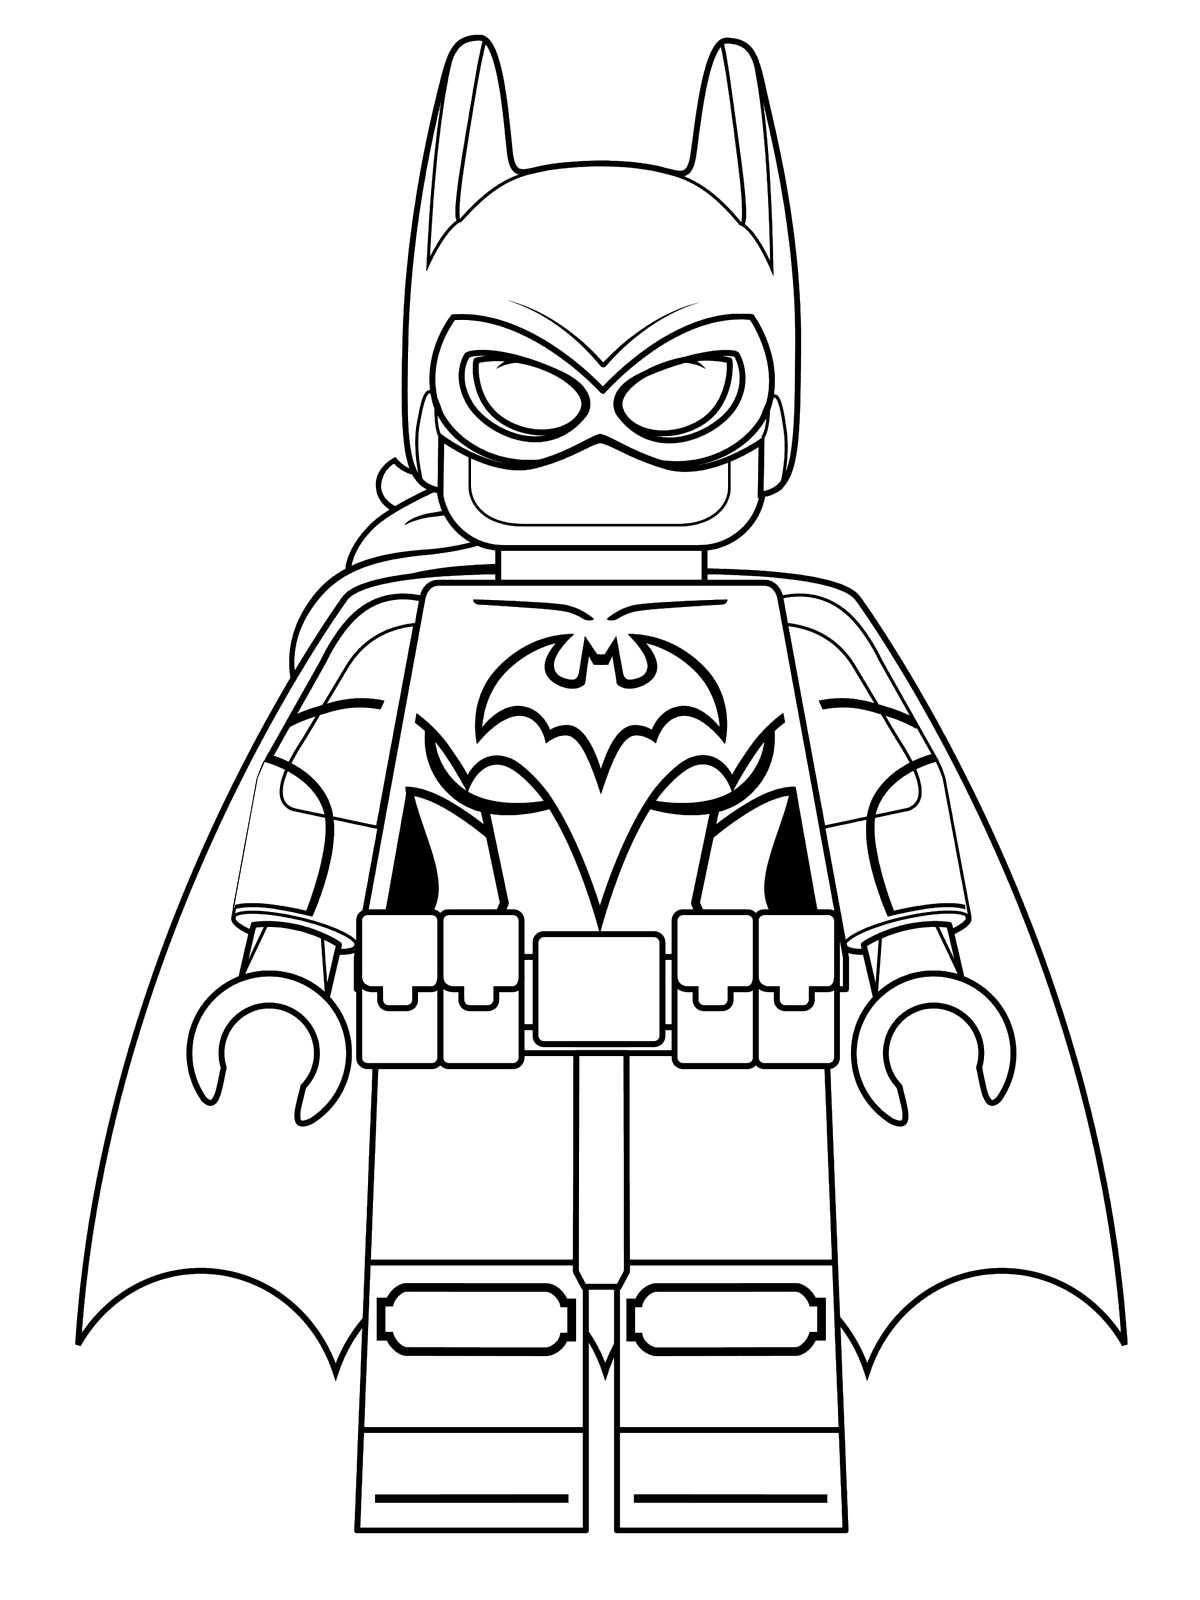 Malvorlage - Lego batman ausmalbilder avzq6